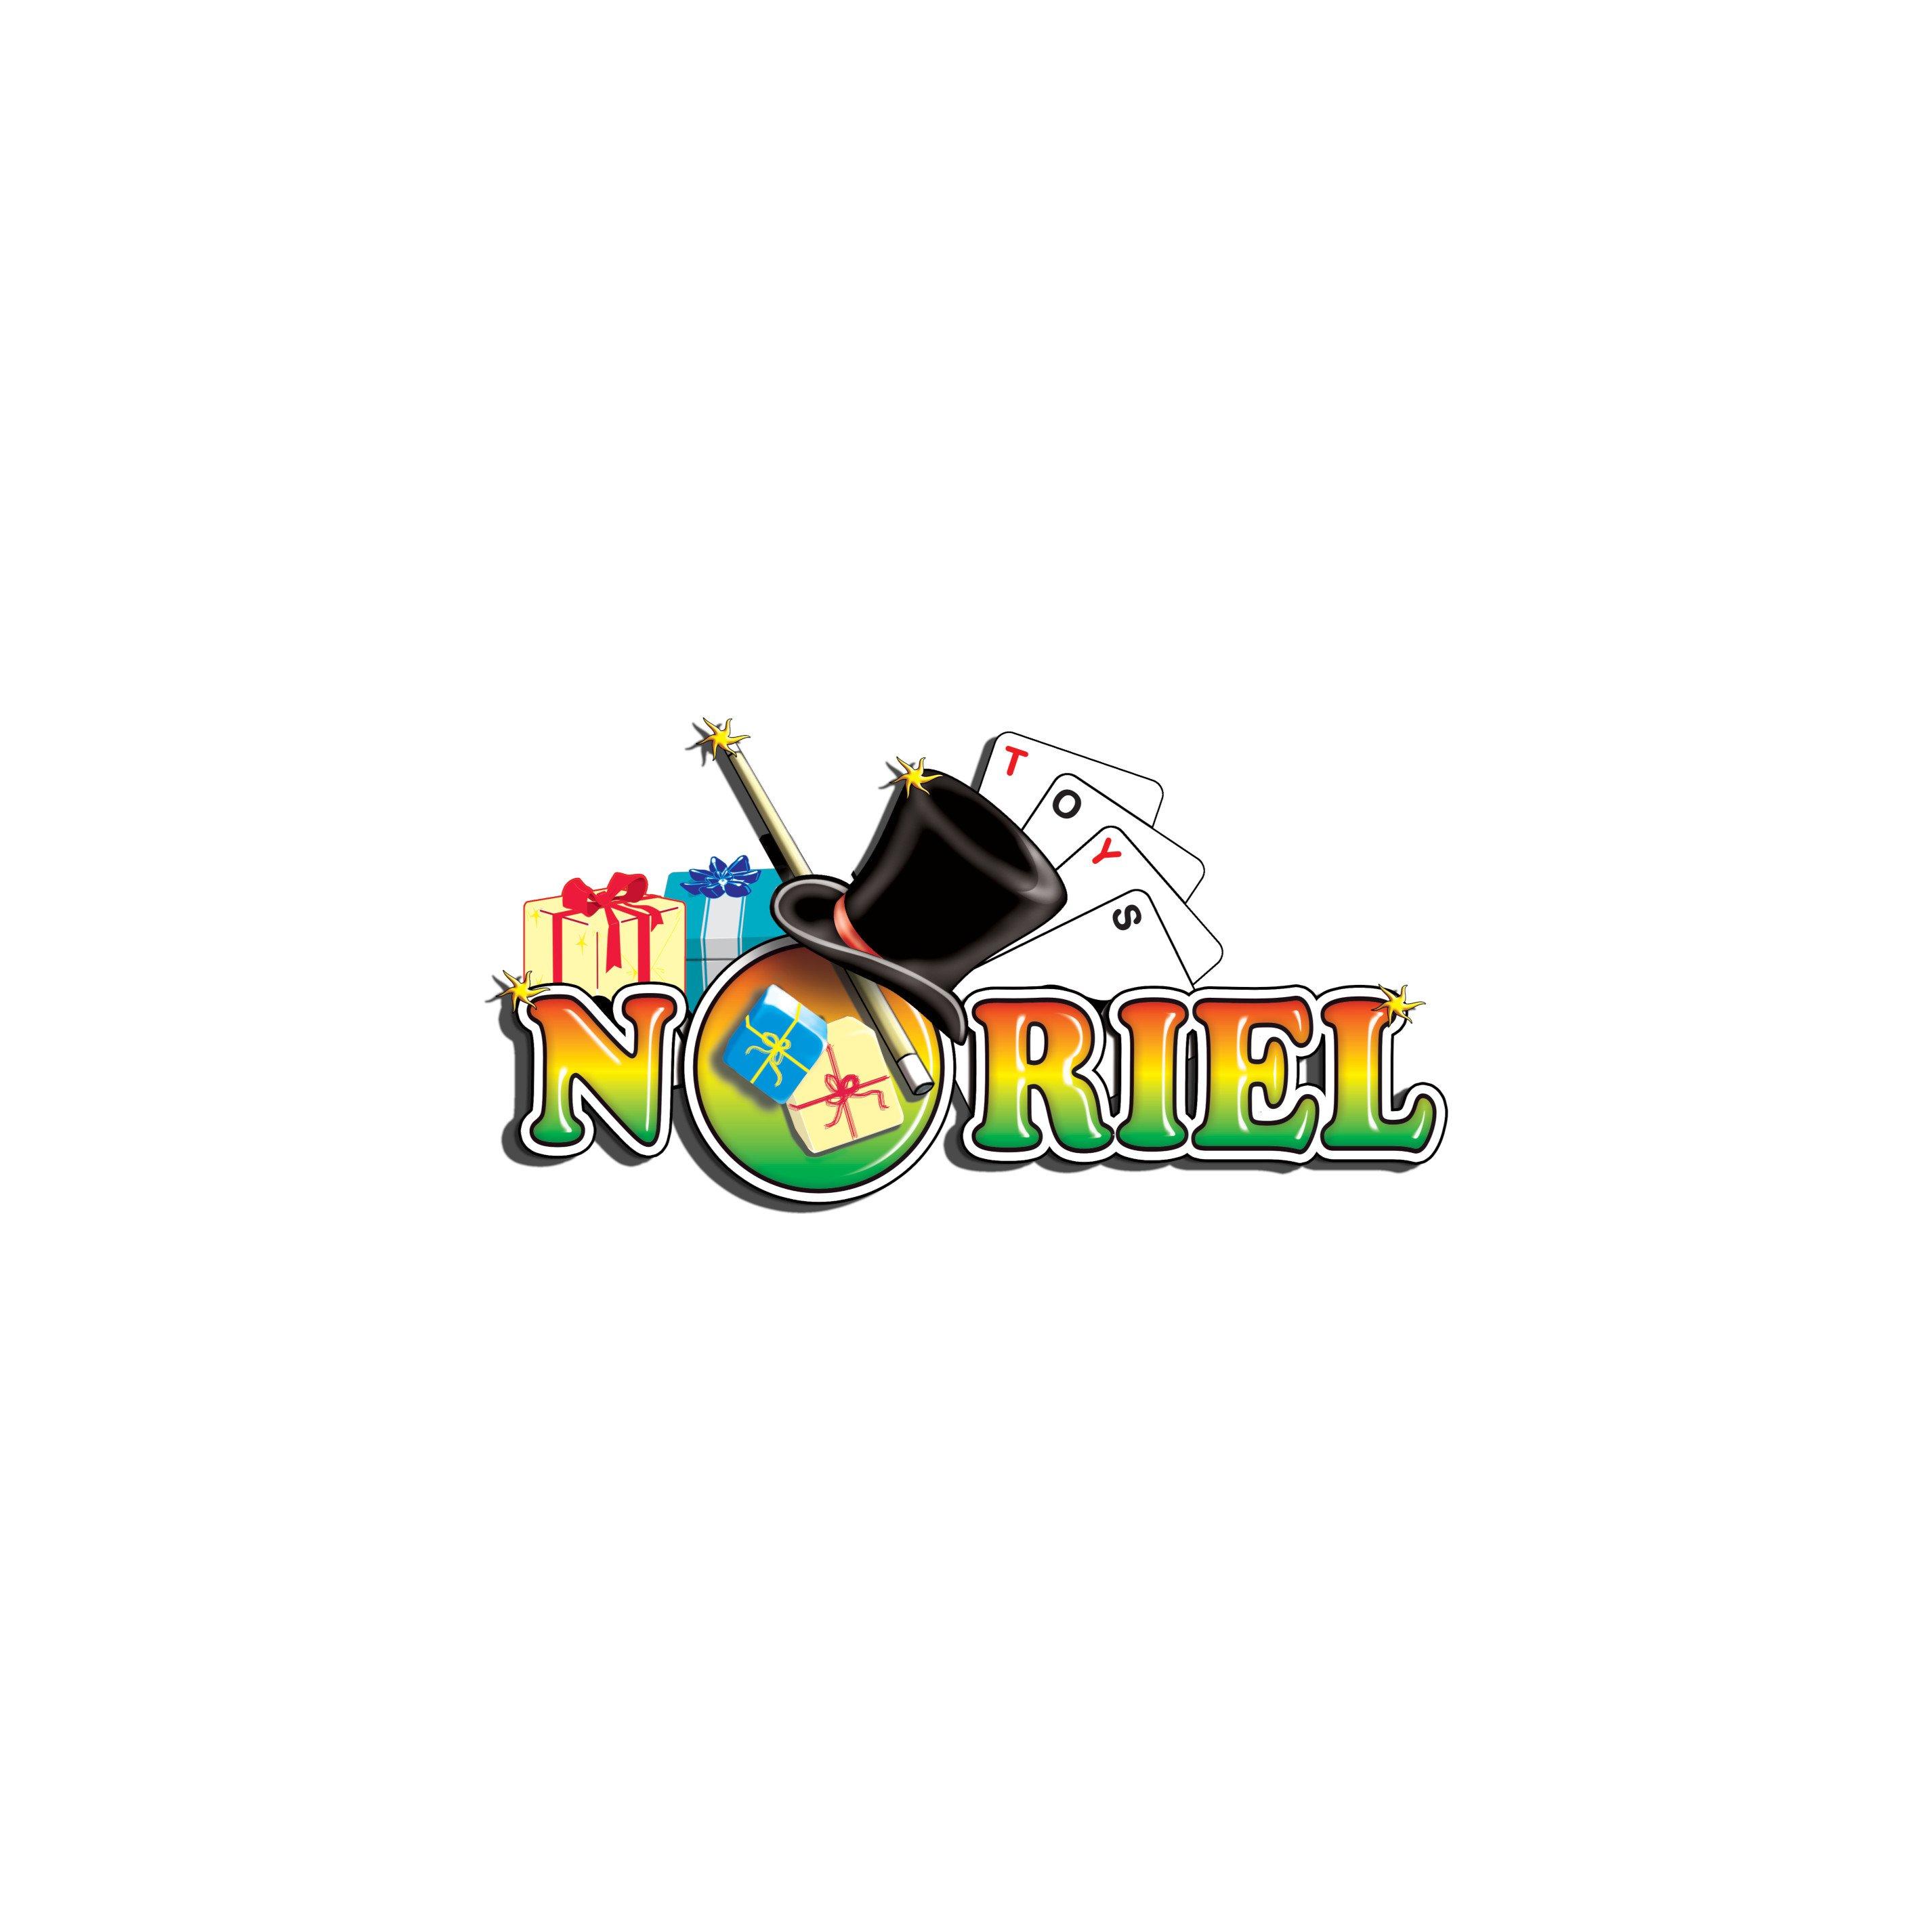 Colectioneaza toate cele 6 personaje, fiecare disponibile in 3 culori: Blurg, Hooboo, Kyro, Spalggles, Squigy si Zoosh.